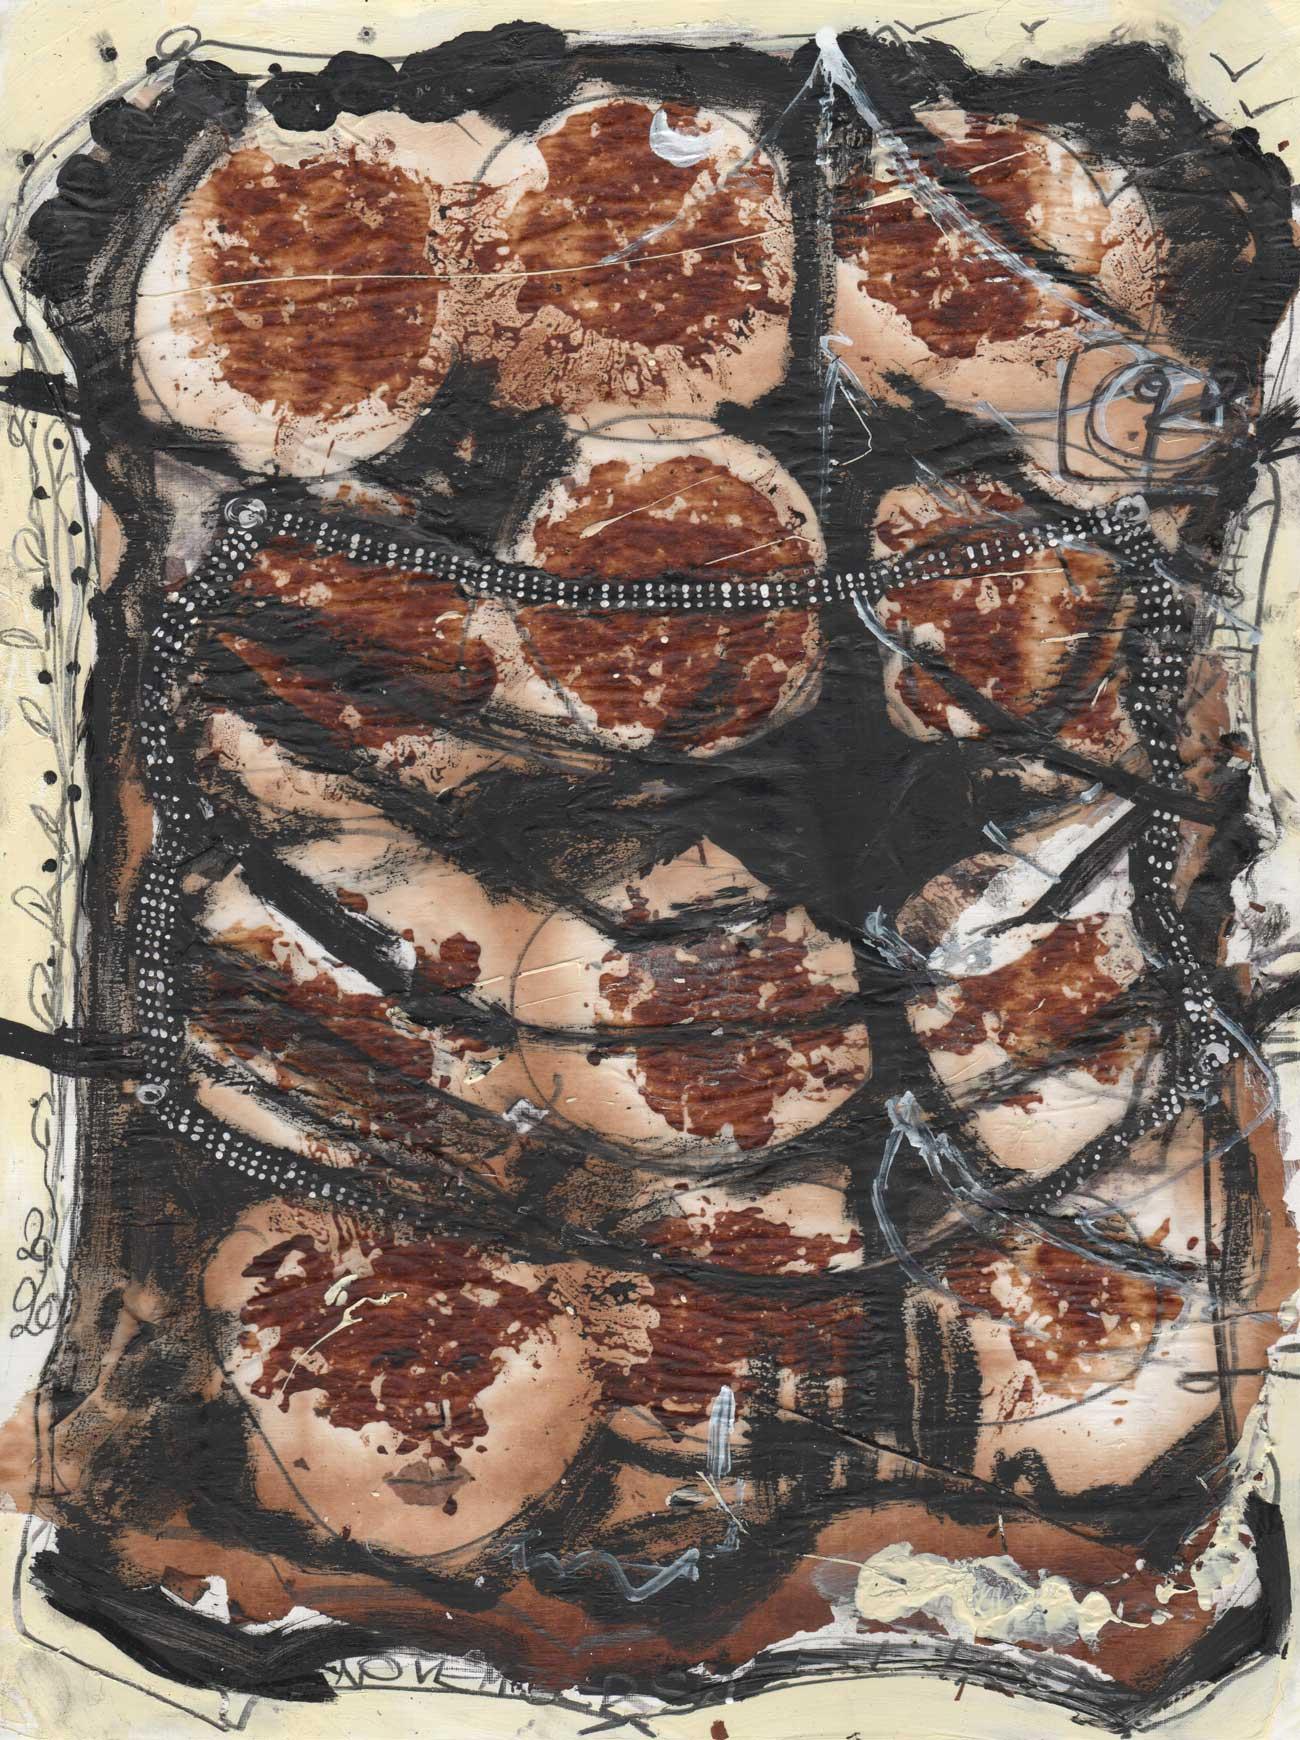 November Sweet Talk Dark cookie parchment paper art KIM OKURA Joytrophies